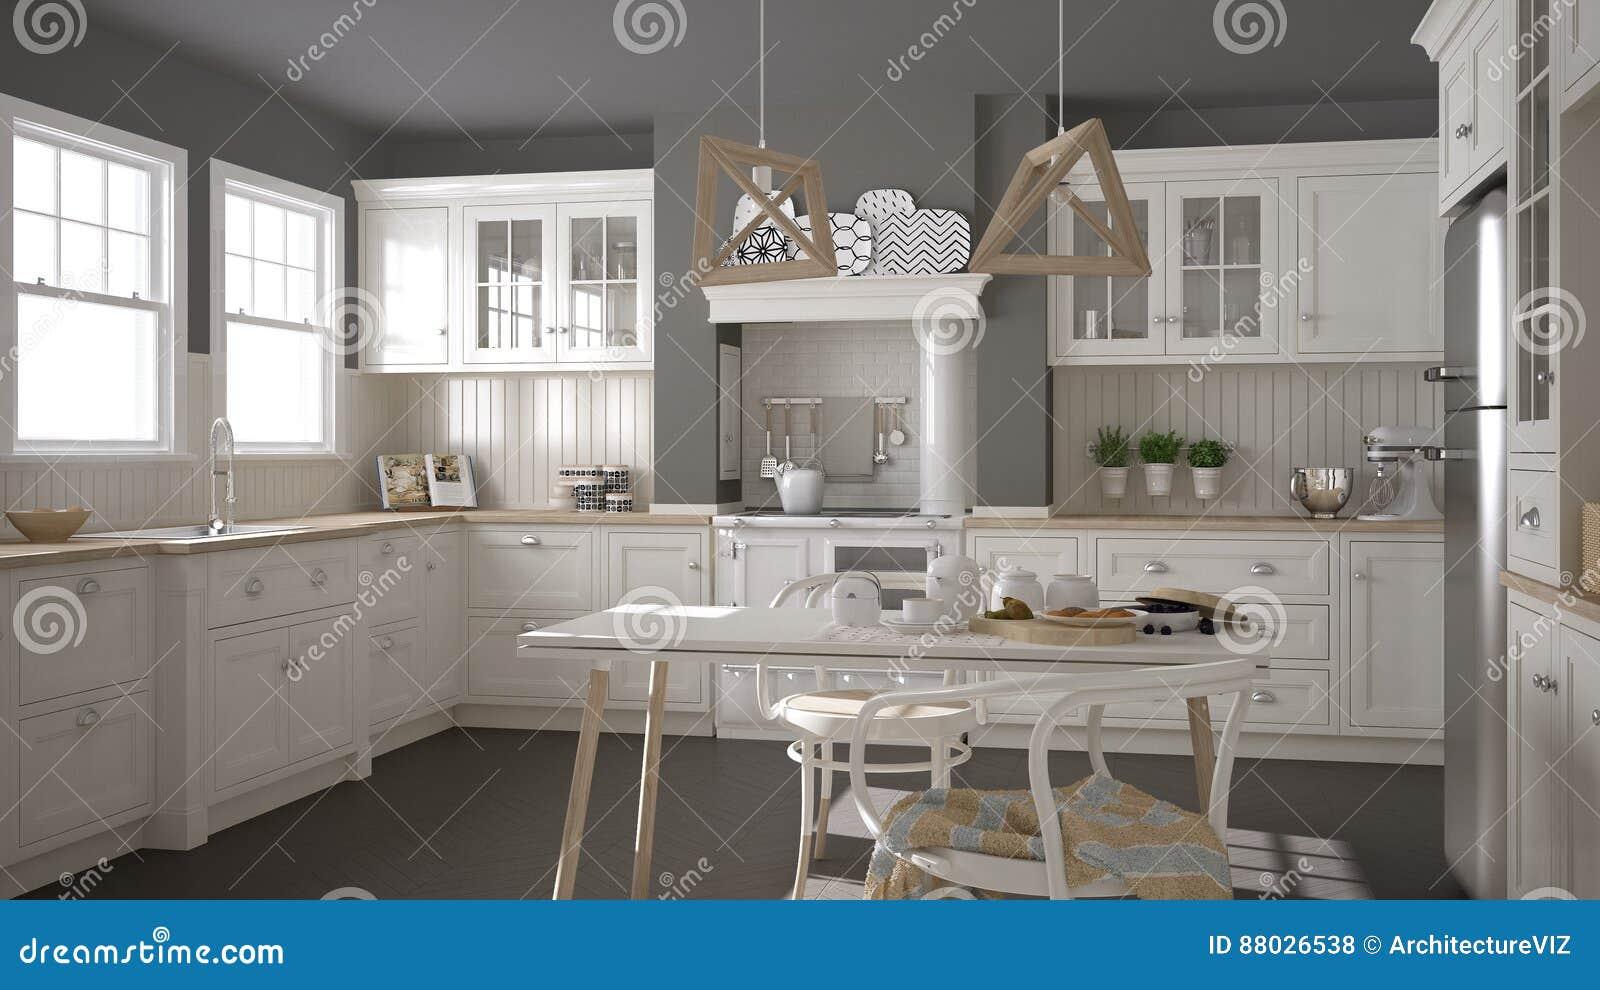 https://thumbs.dreamstime.com/z/cucina-bianca-classica-scandinava-con-i-dettagli-di-legno-minimali-88026538.jpg